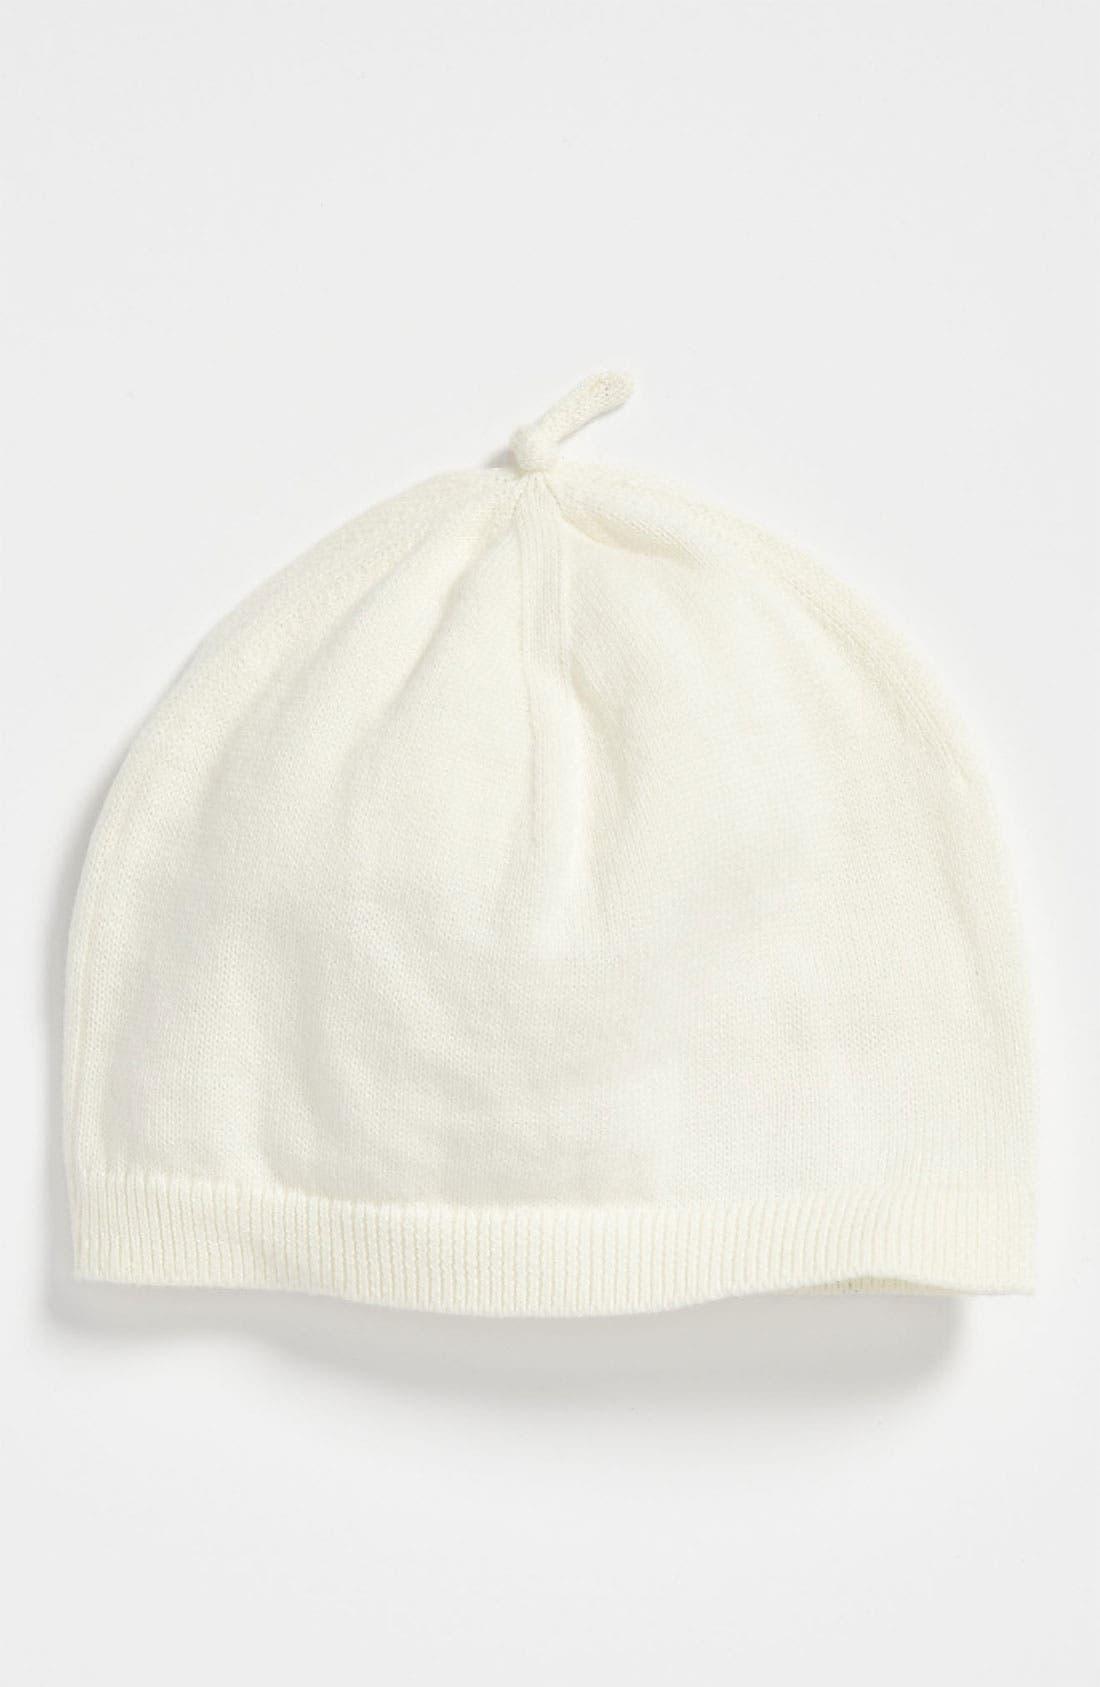 Alternate Image 1 Selected - Nordstrom Baby Hat (Infant)